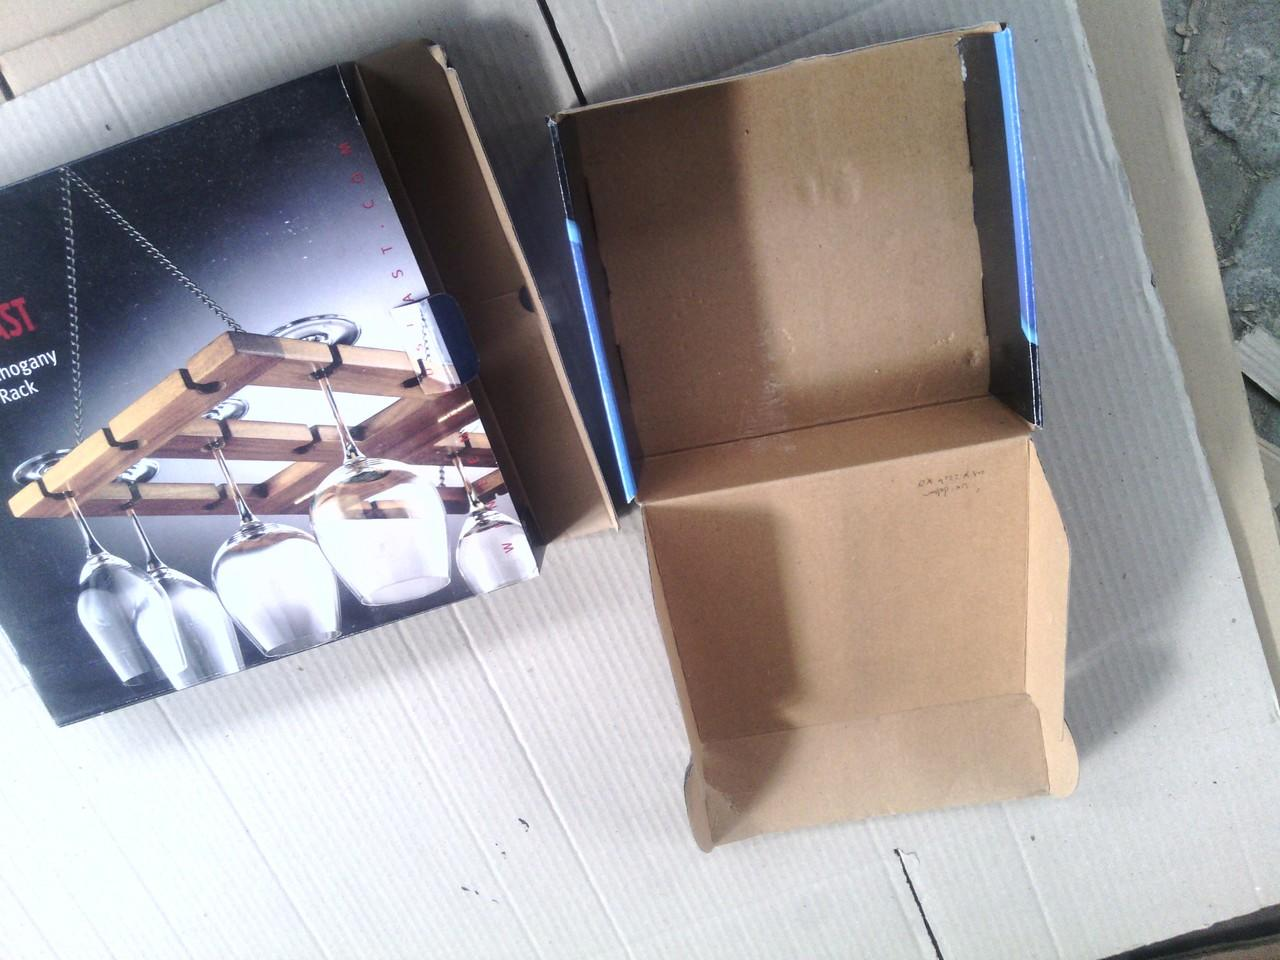 KartonBox, Karton Box Yogya, Kartonbox, Karton Yogya, Karton Box Yogyakarta, Karton B